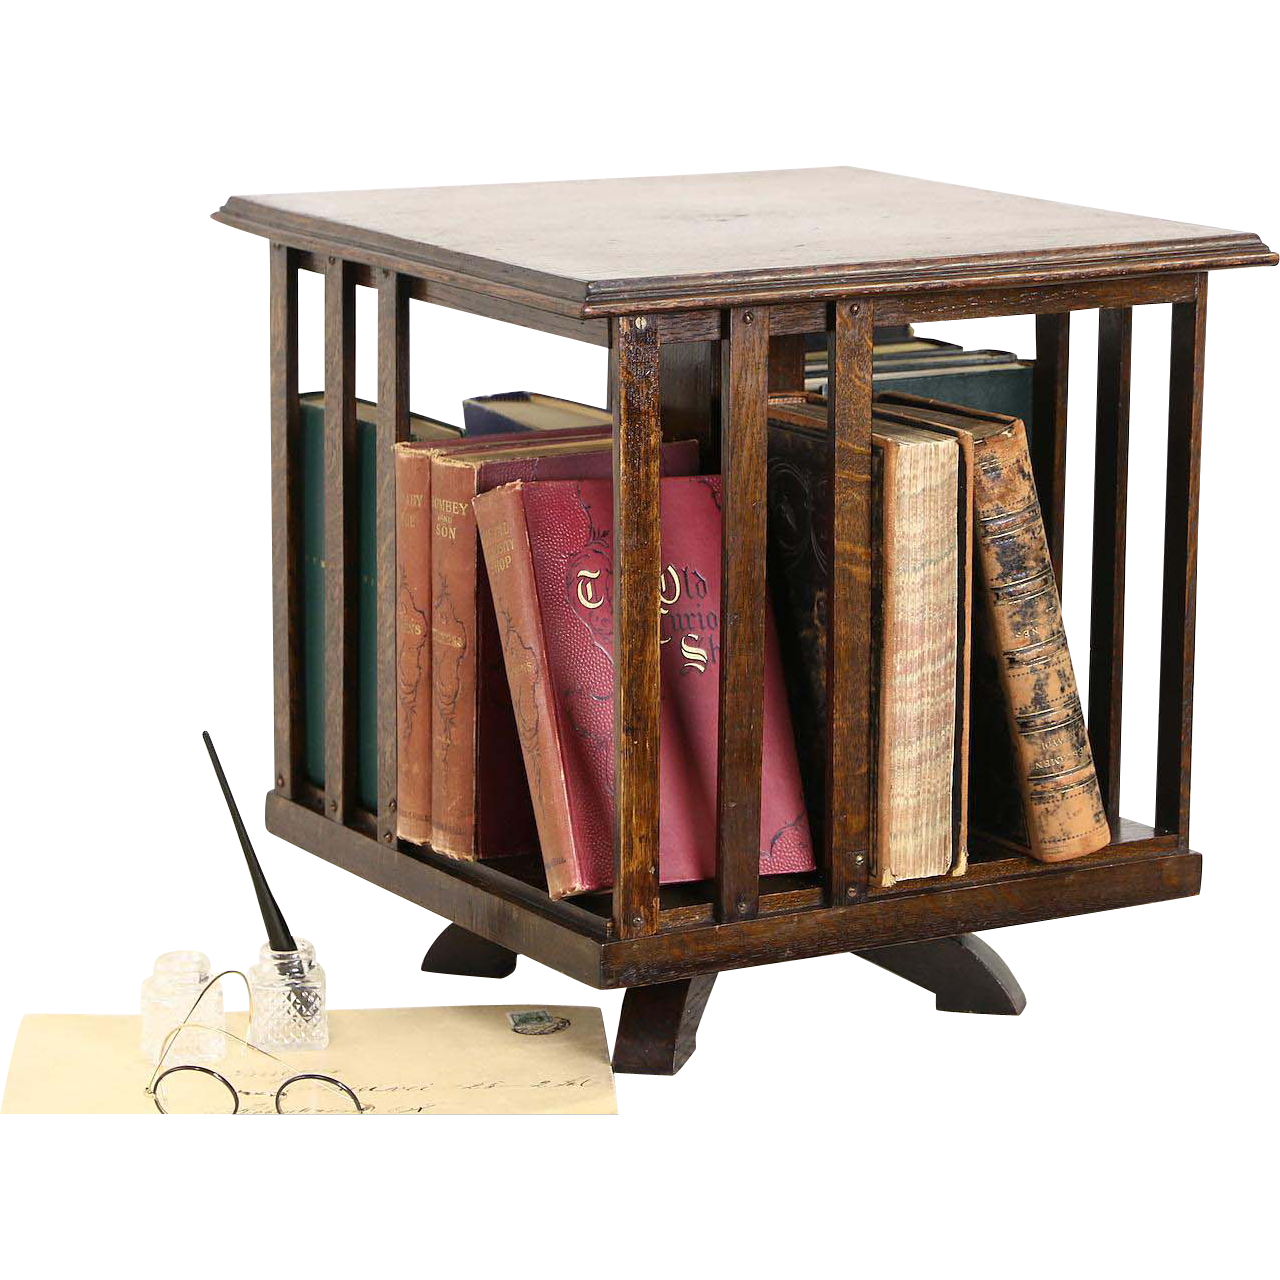 Desktop Revolving Oak 1910 Antique Spinning Bookcase